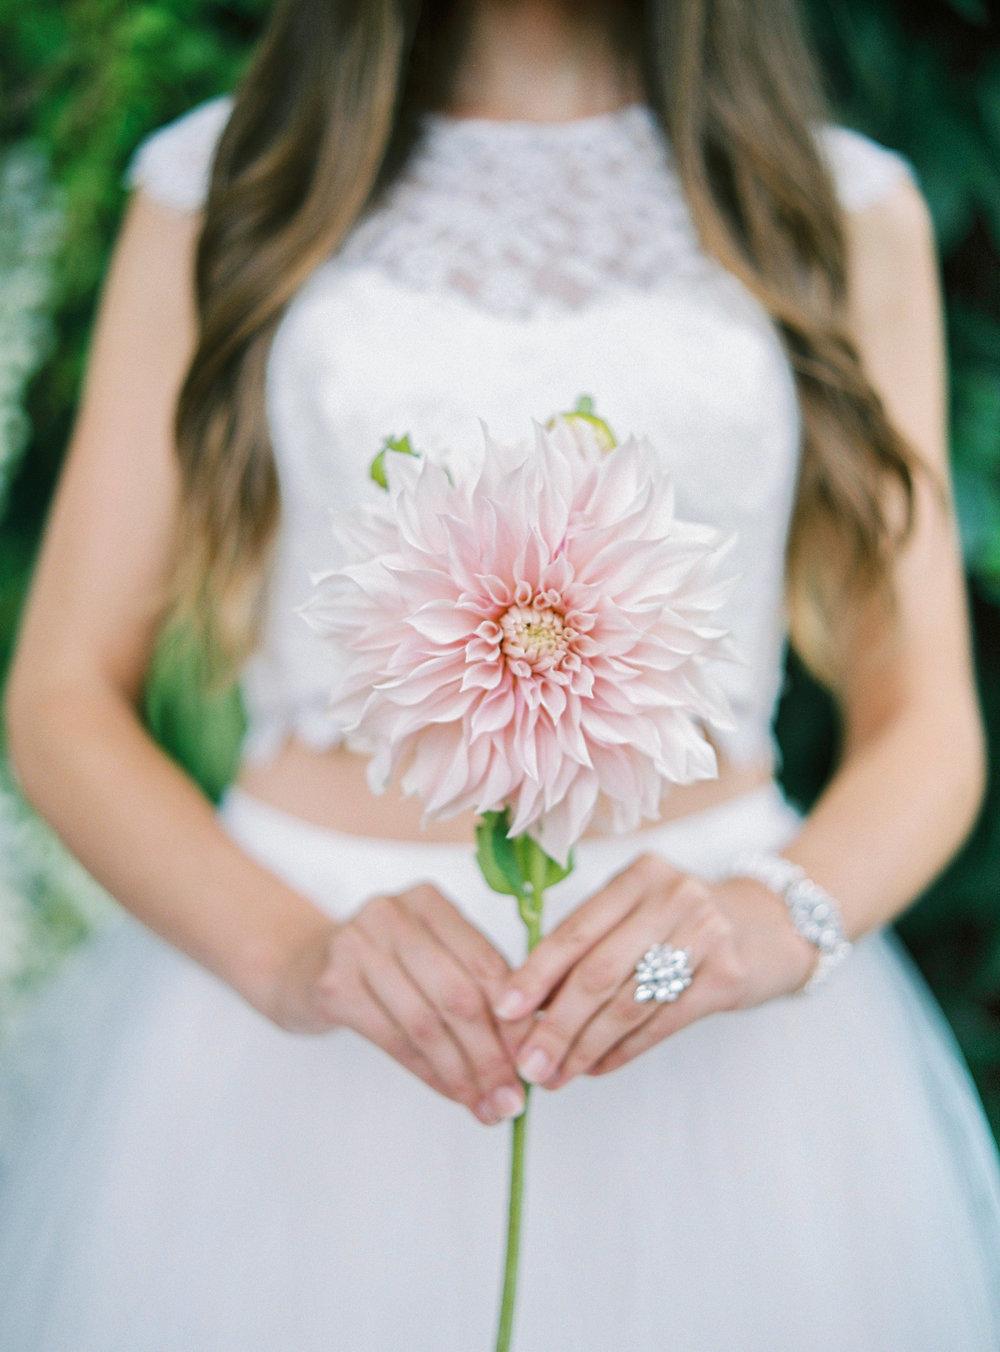 The Bridal Boutique • Hayley Paige • Romantic Garden Wedding